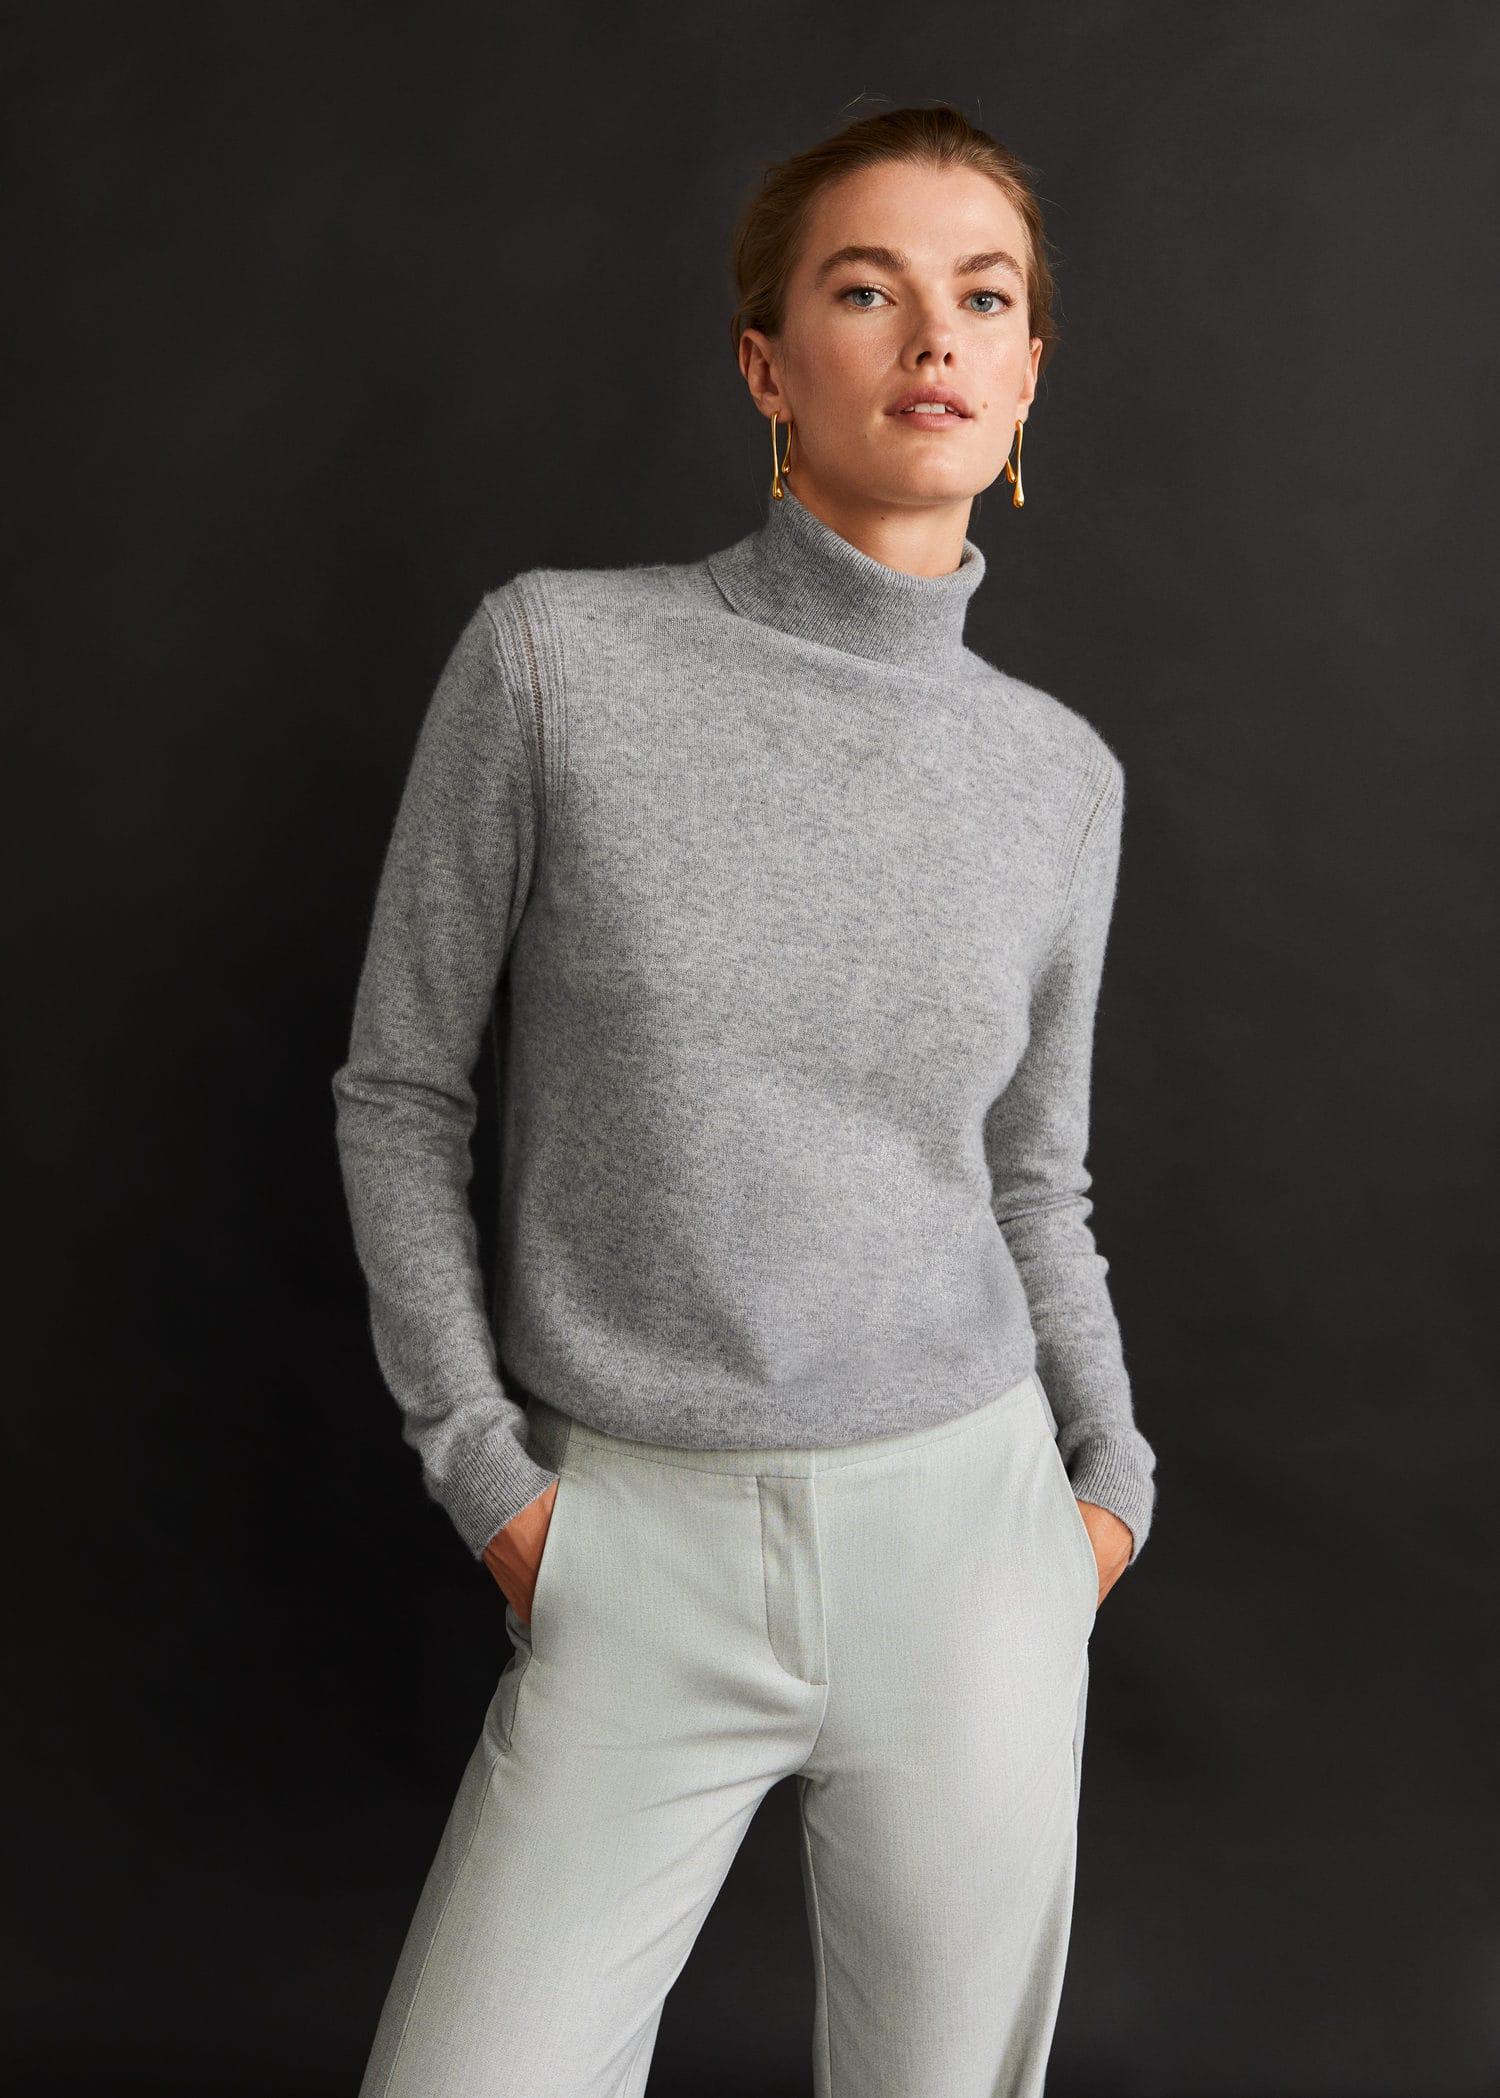 Turtleneck 100% cashmere sweater Woman | Mango Kosovo